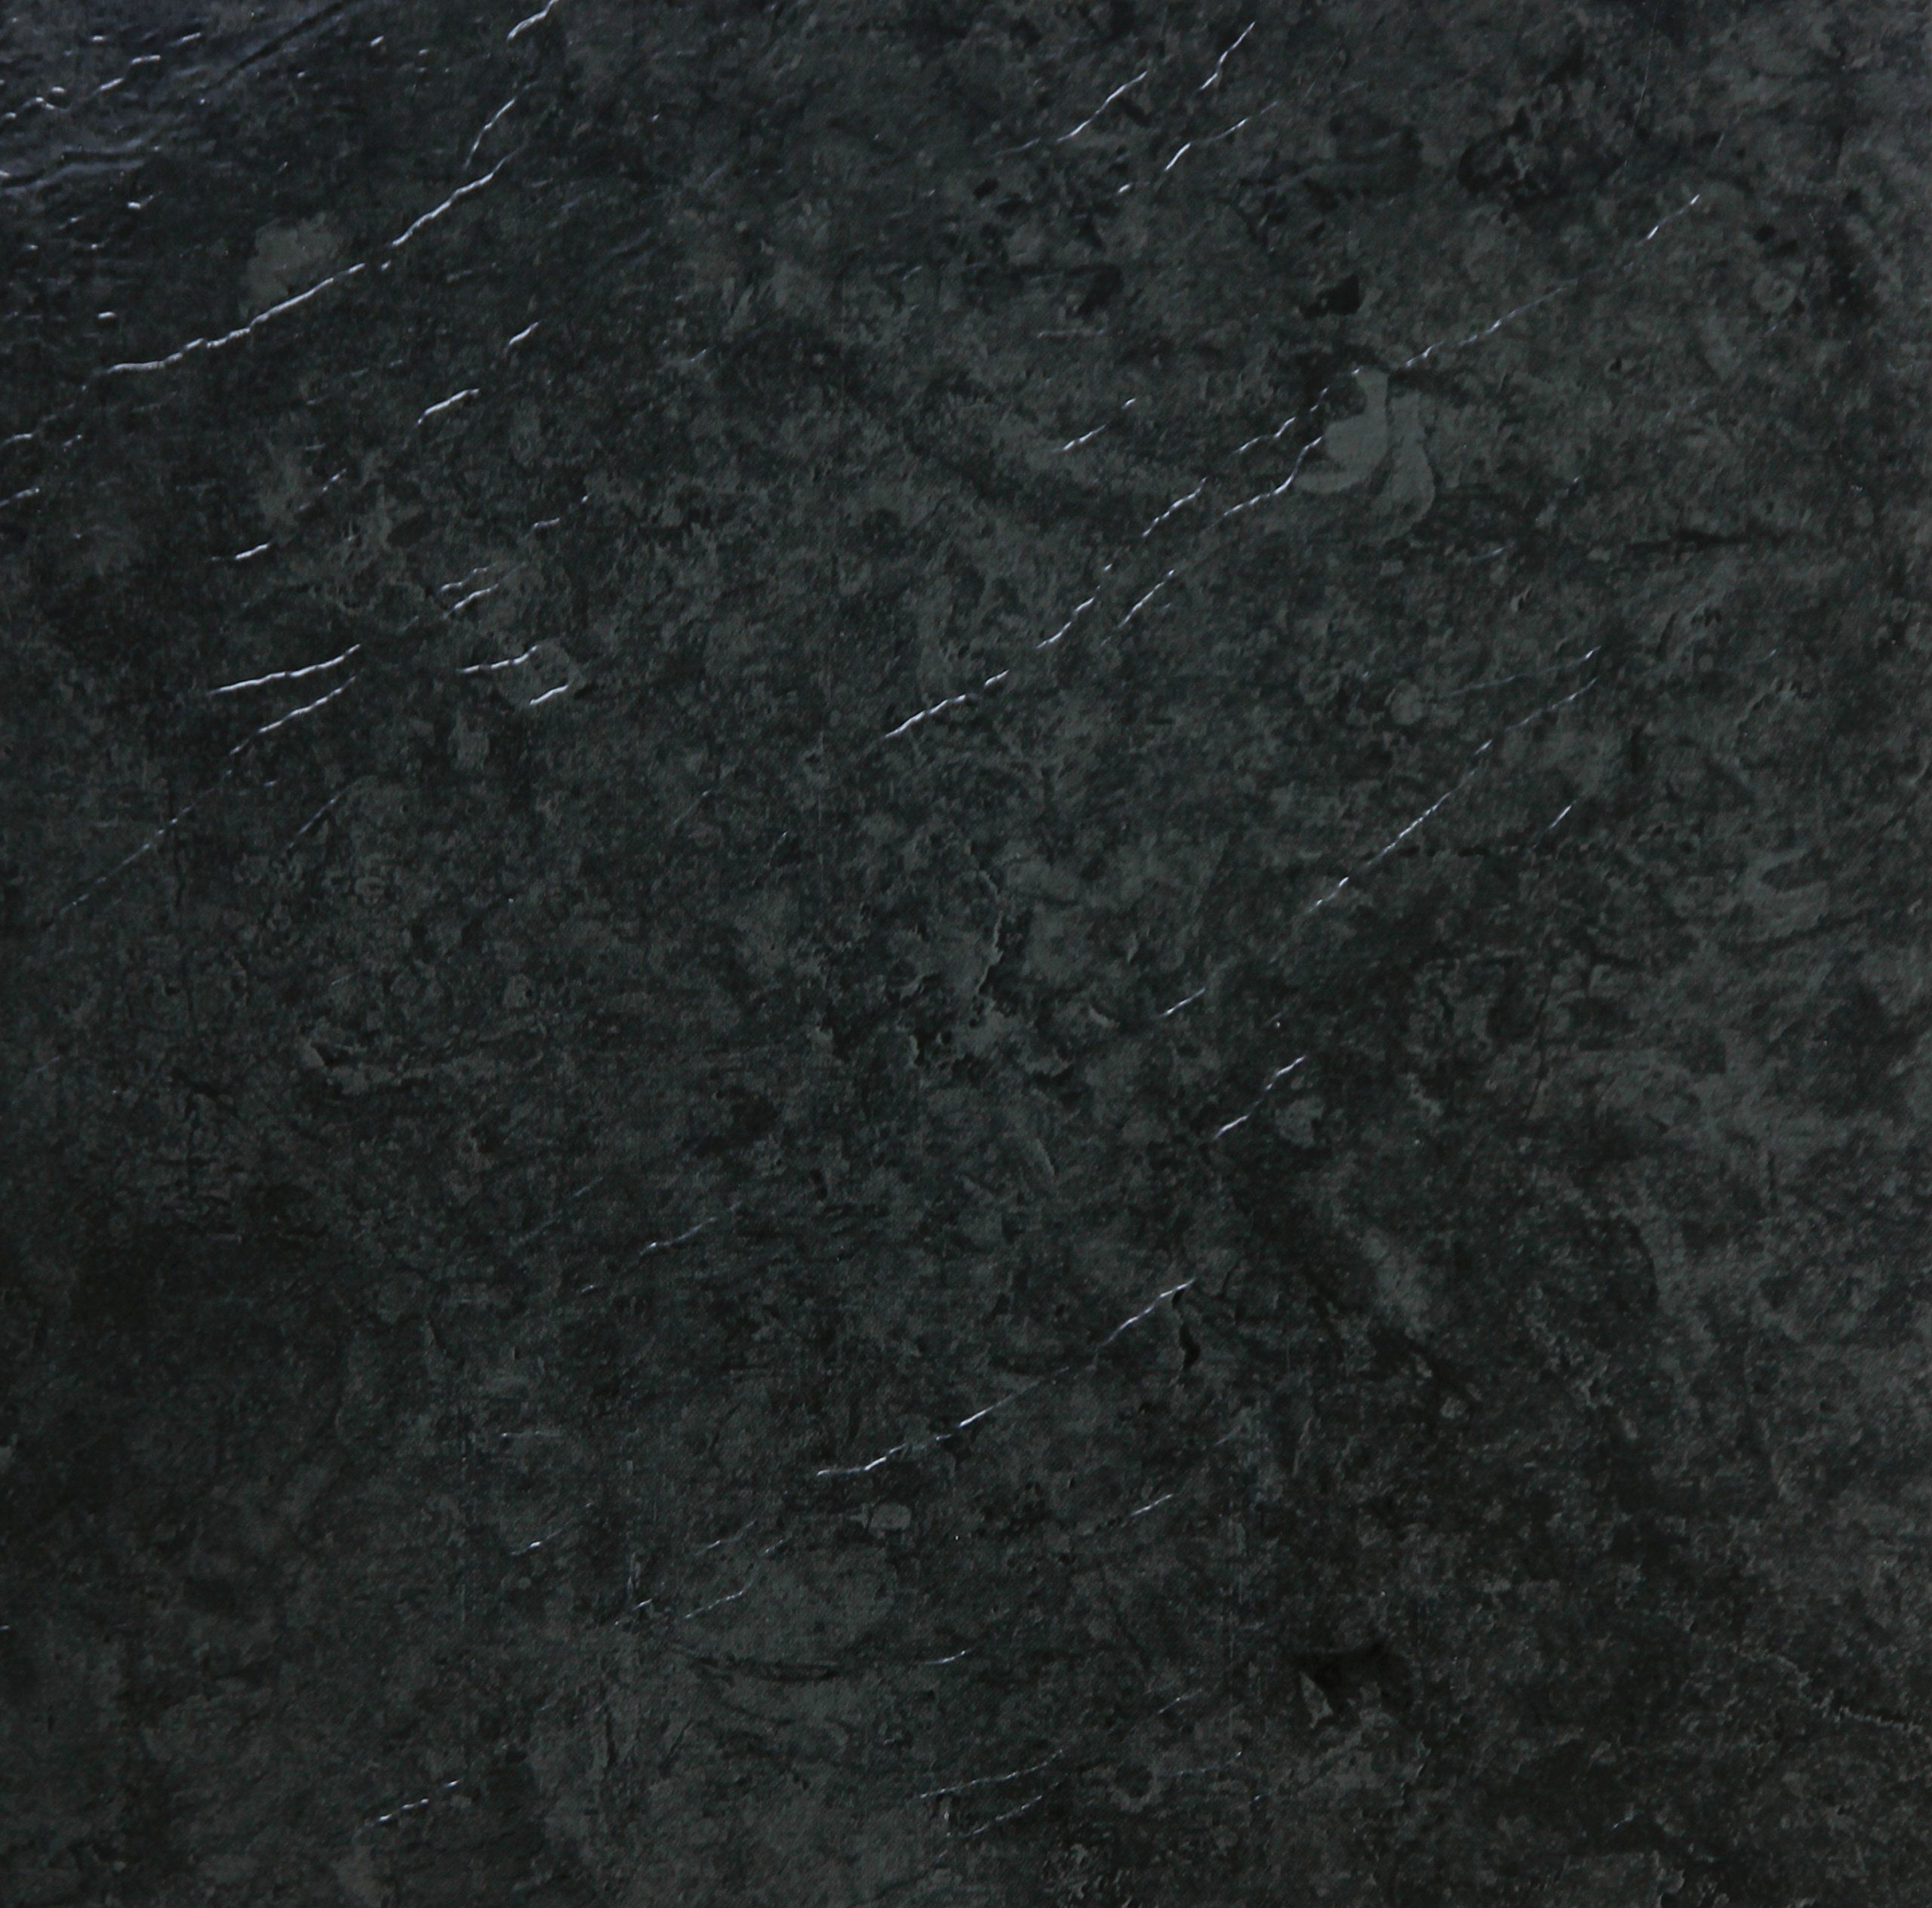 dcfix® High Quality Self Adhesive Vinyl Floor Tiles